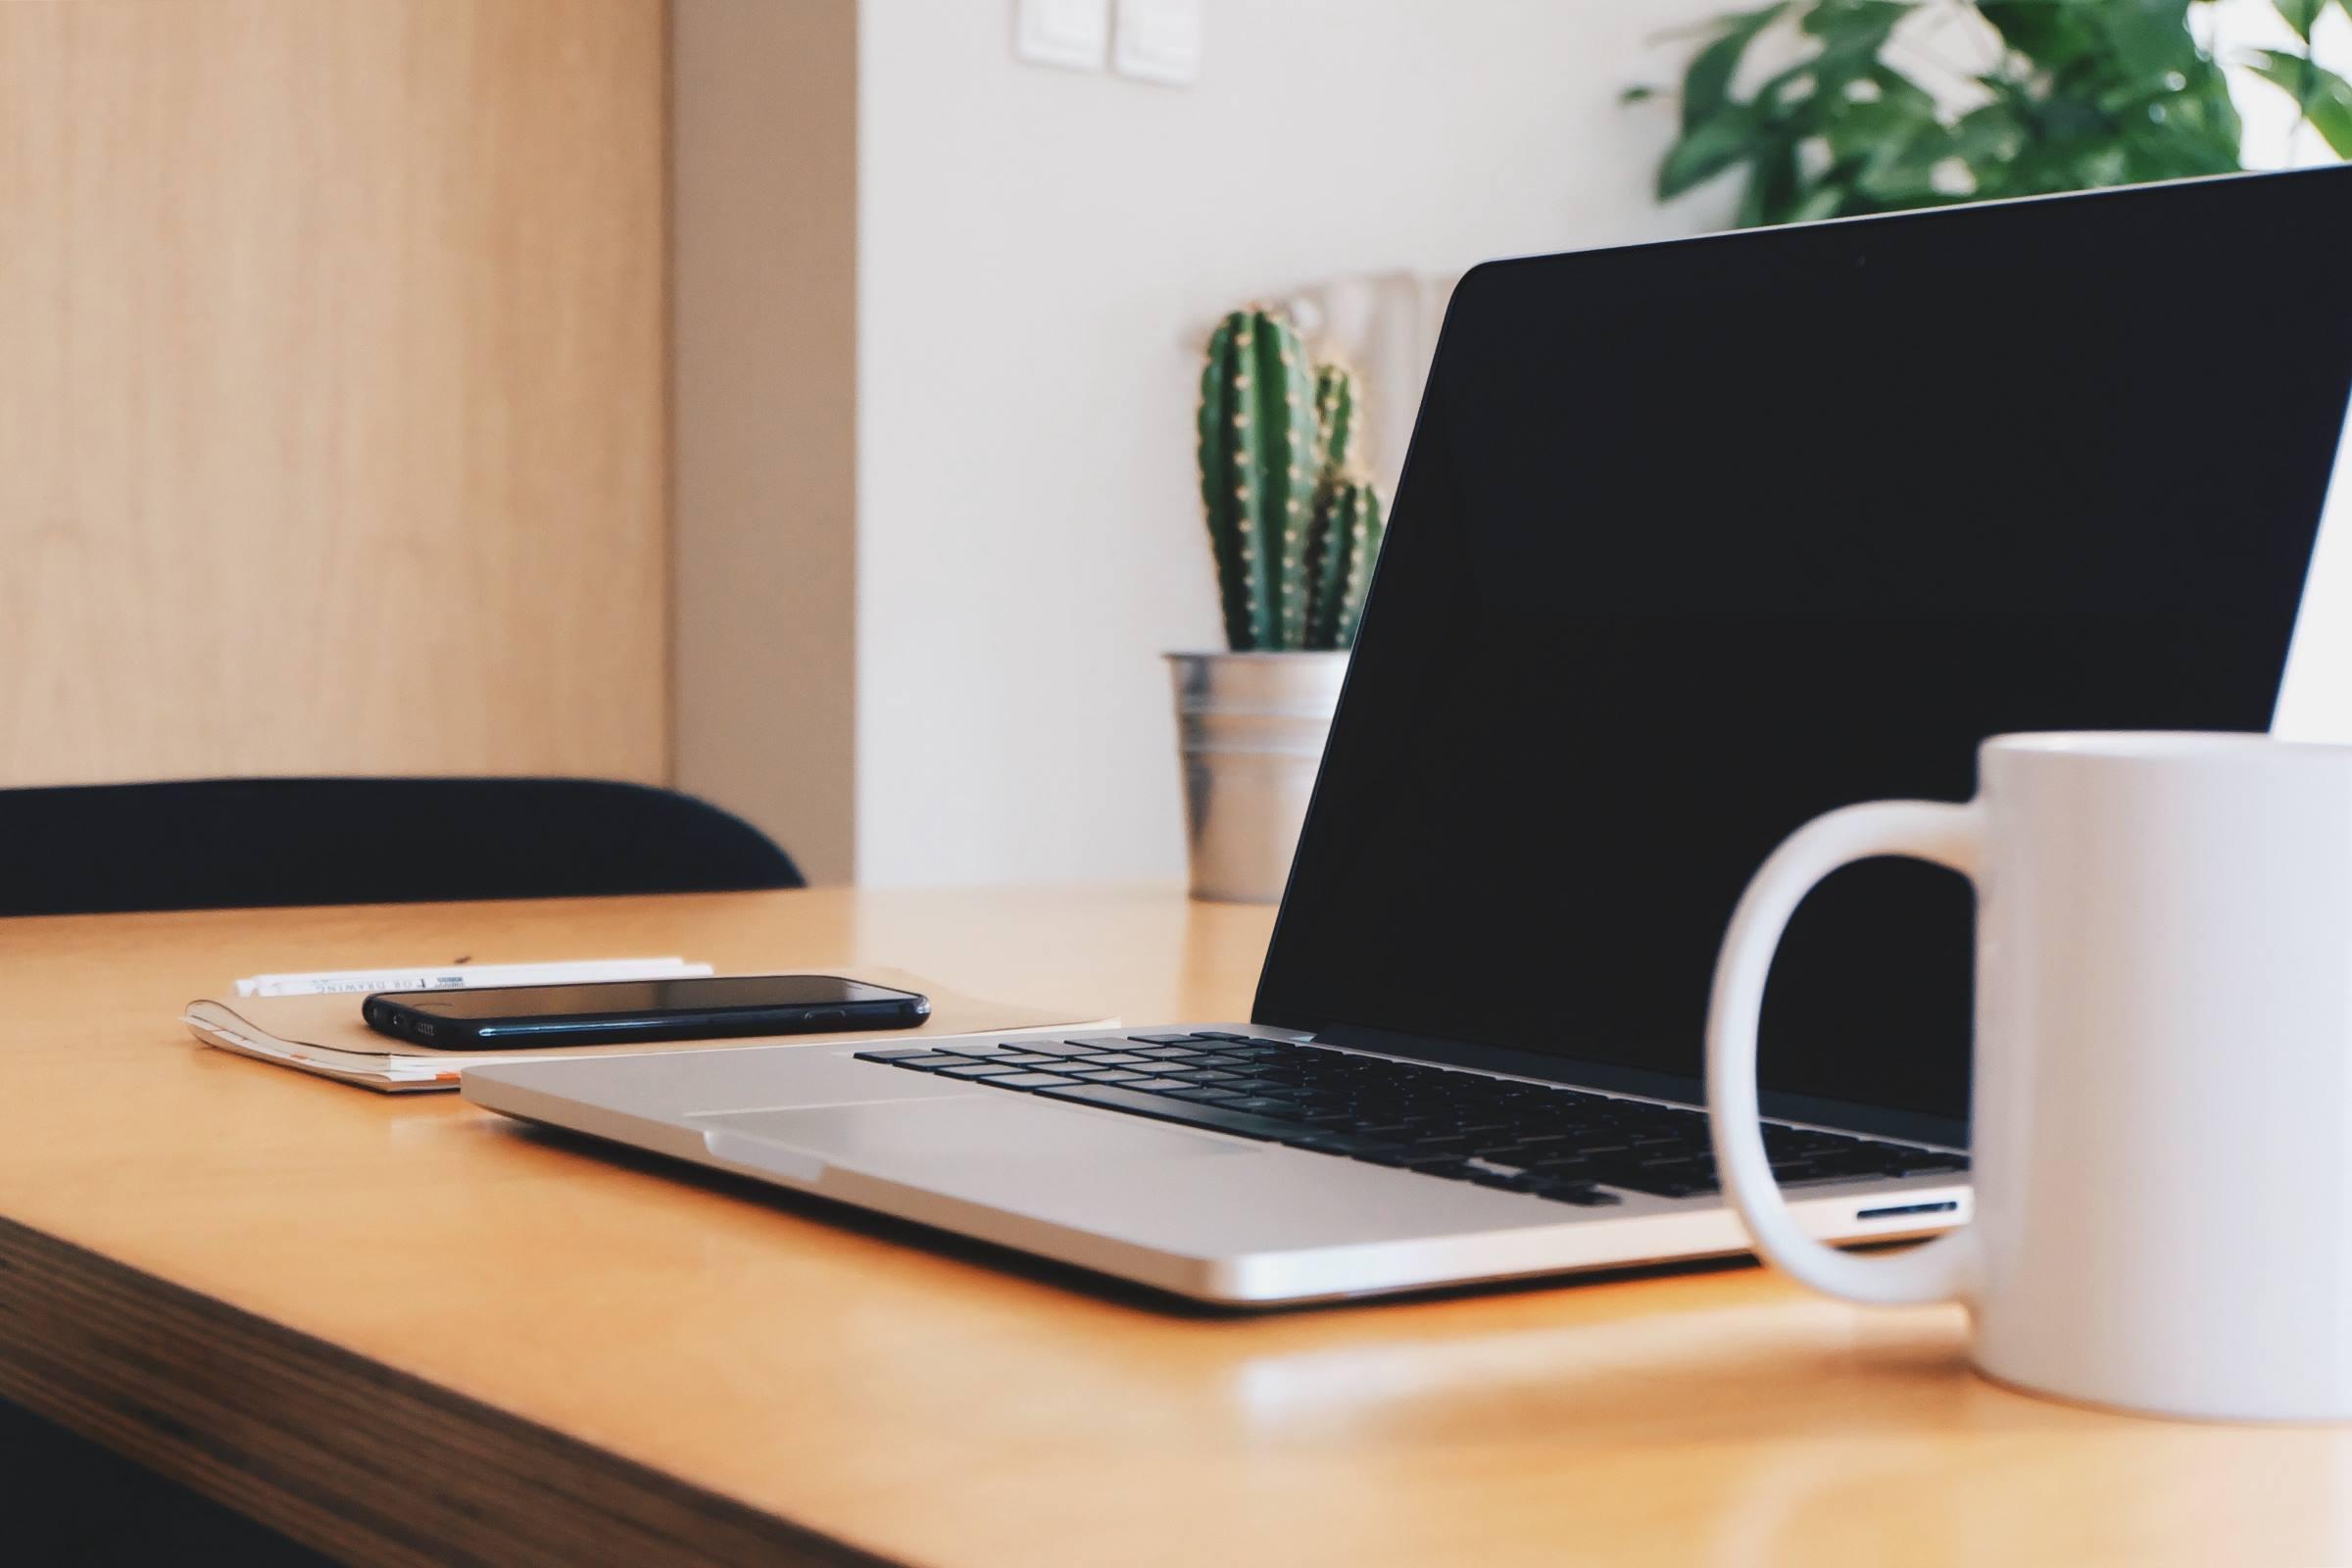 laptop mobile coffee mug plant office